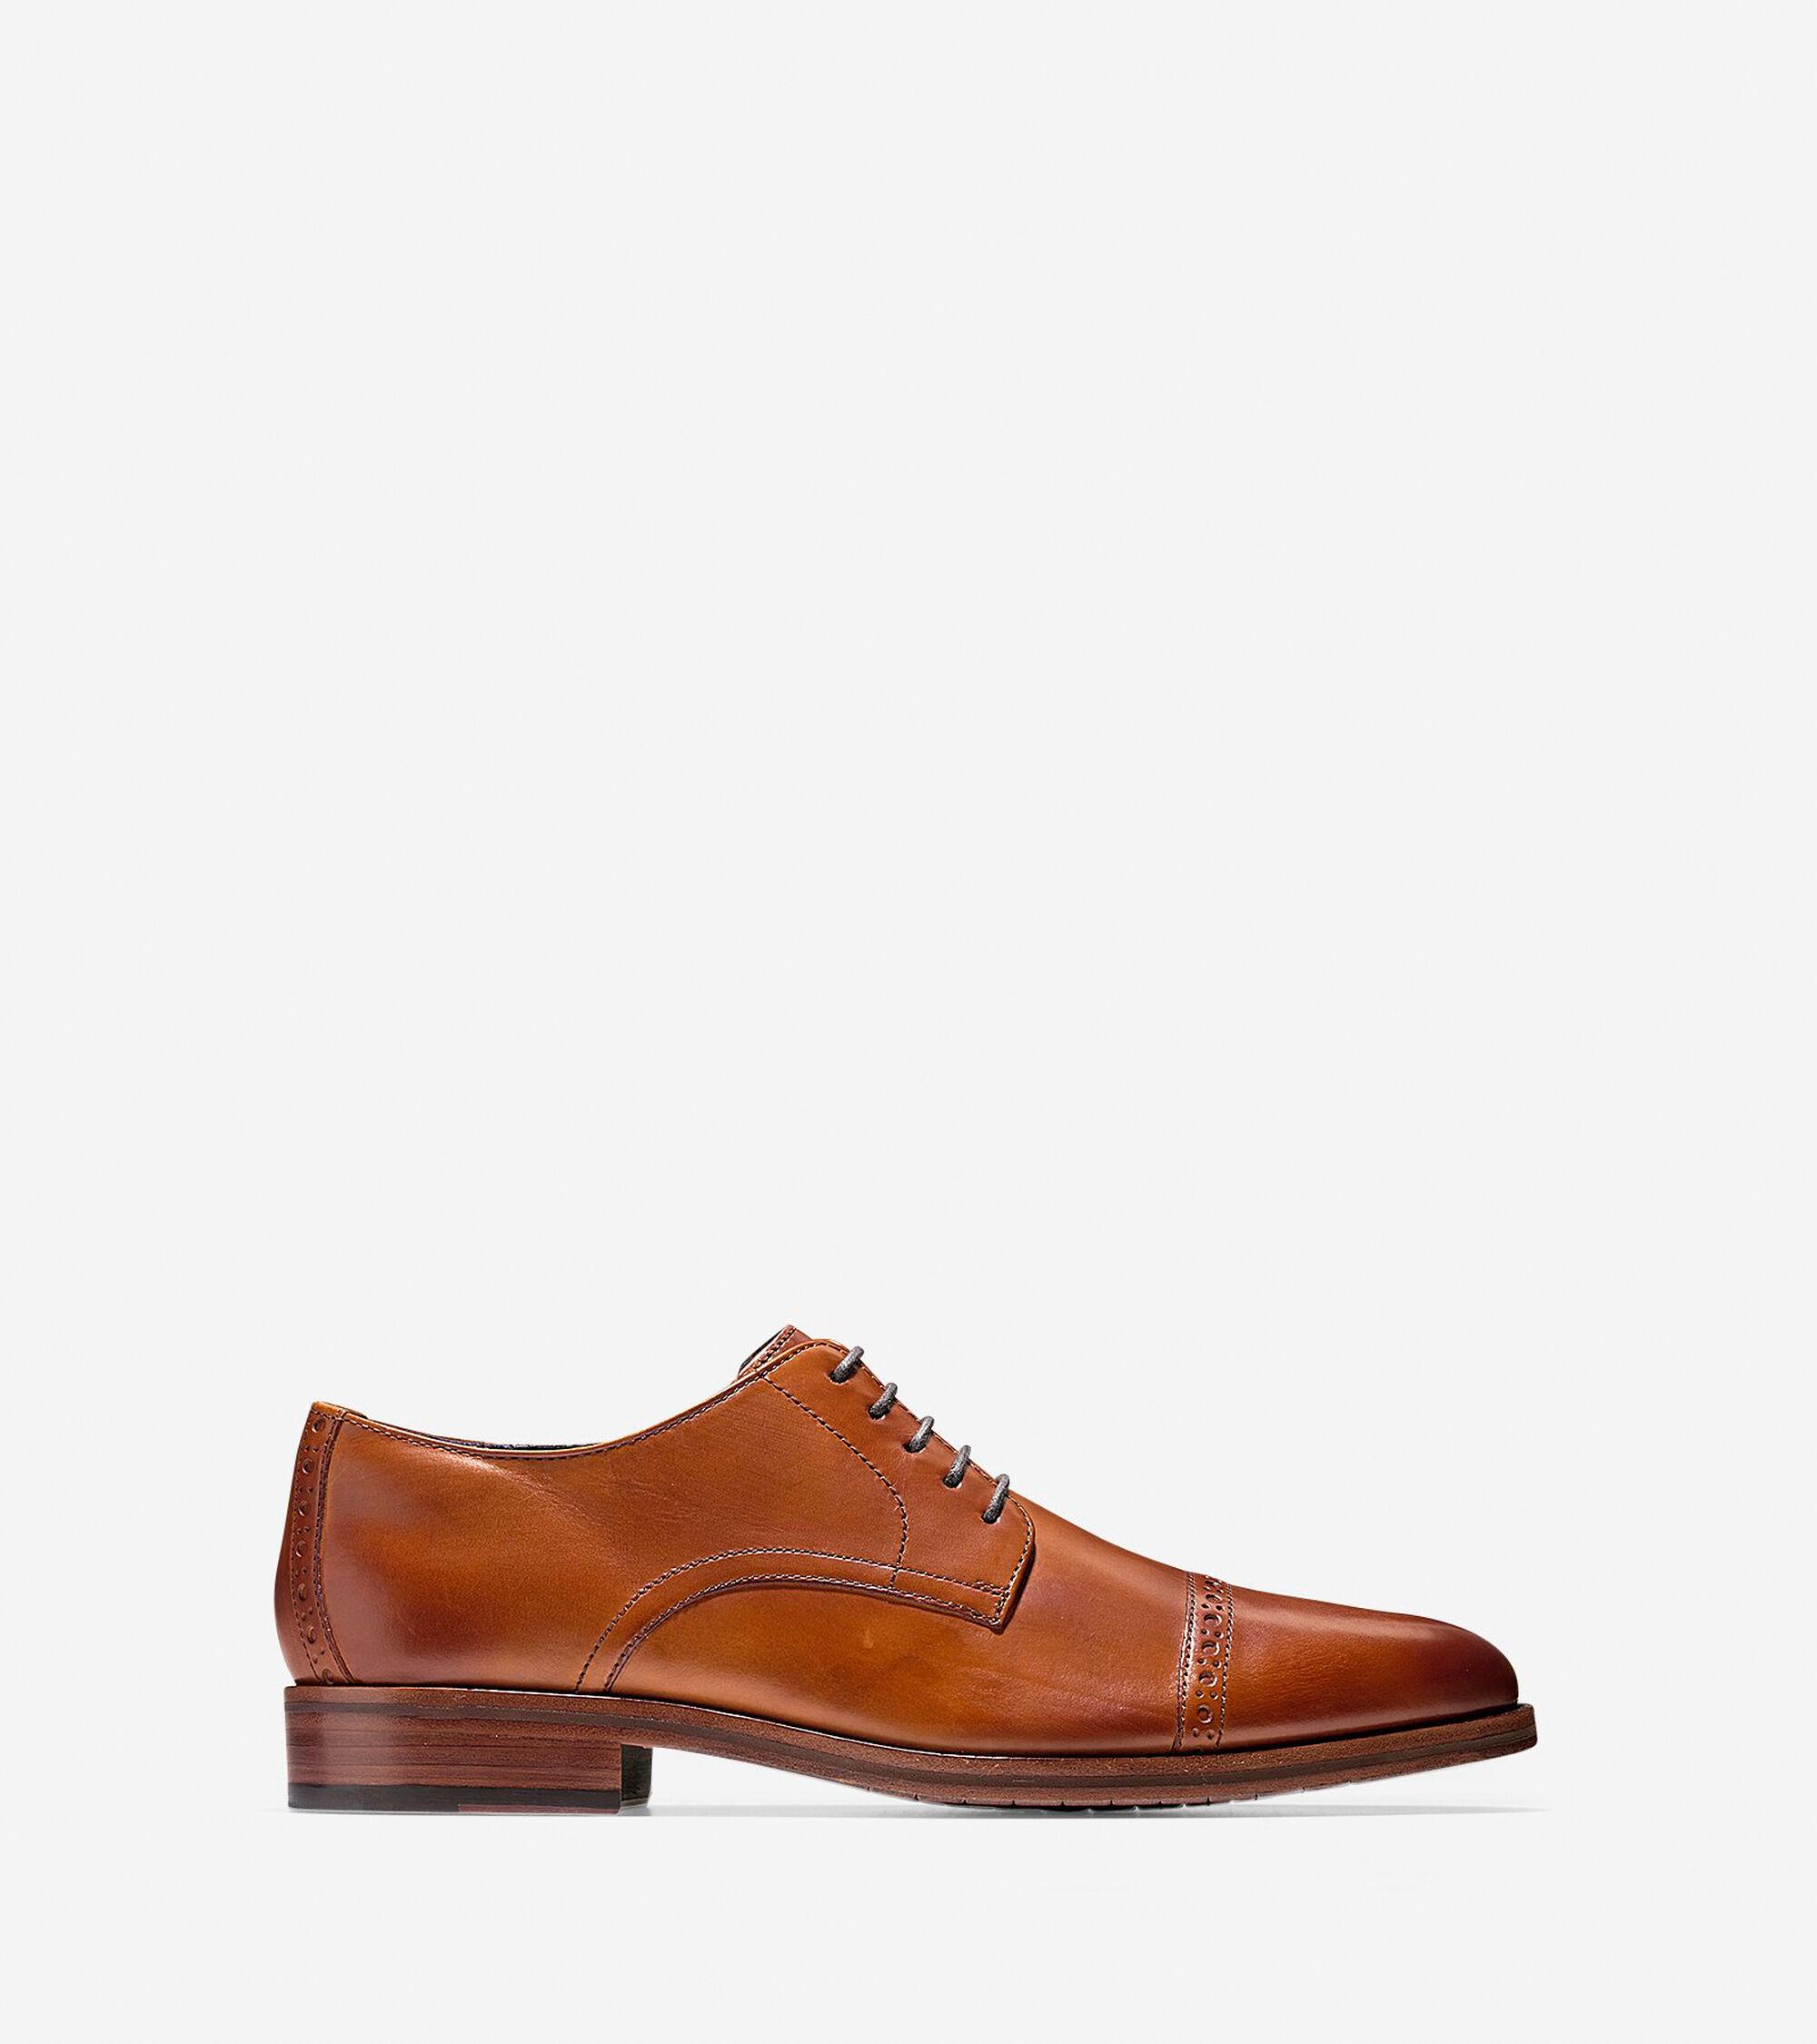 Cole Haan Washington Grand Cap Toe Oxford Shoes